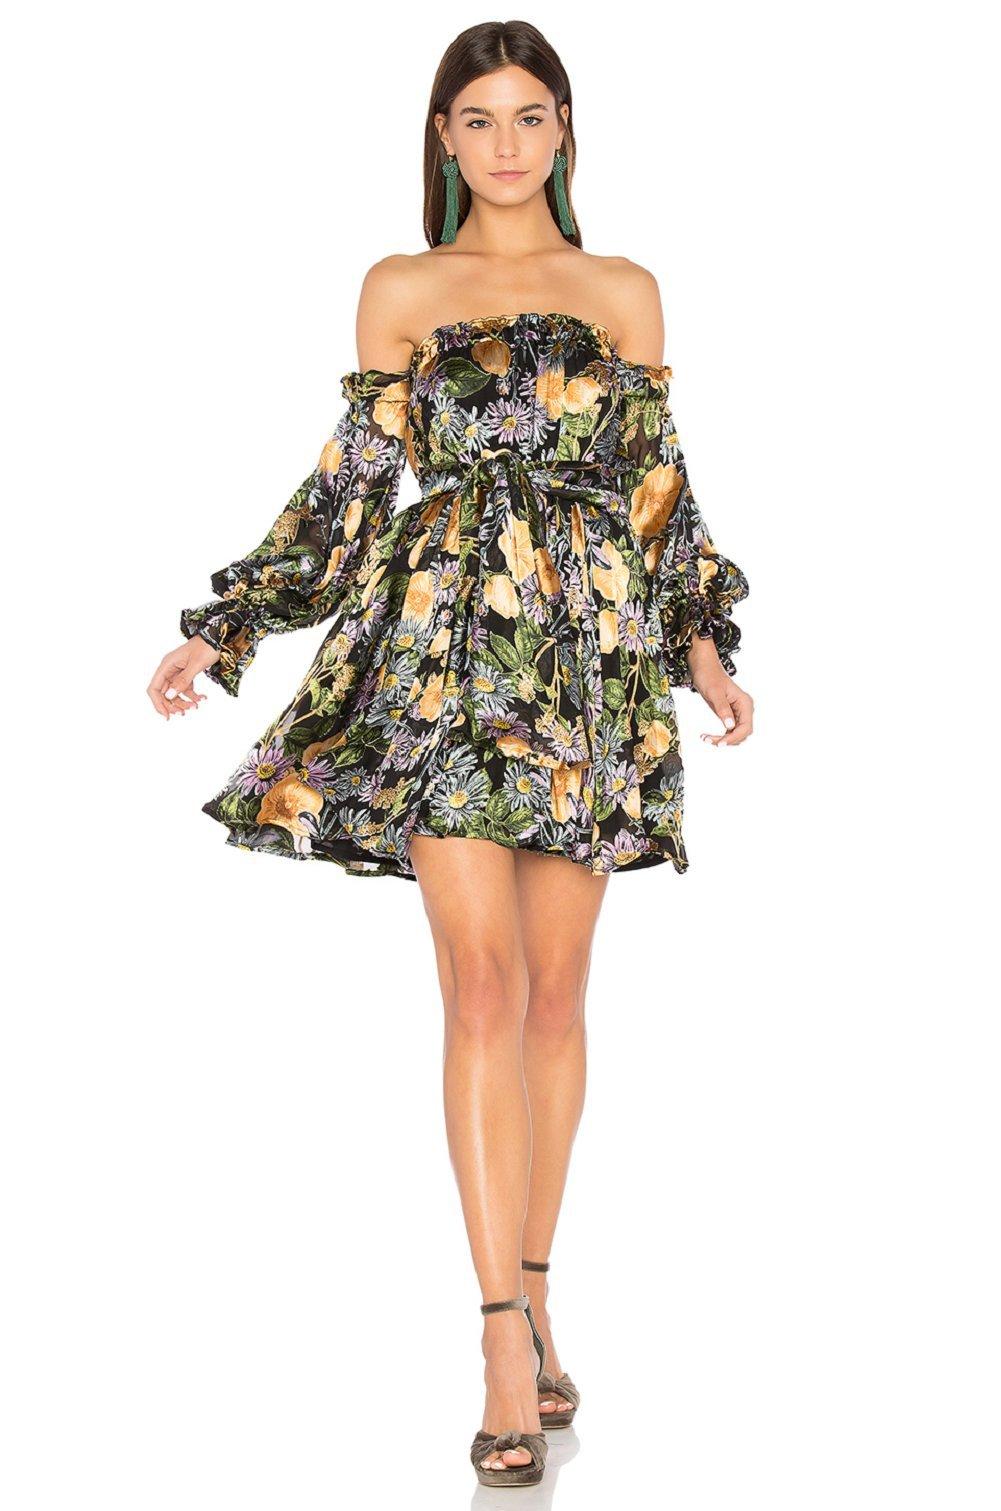 For Love and Lemons Women's Luciana Strapless Dress Black Floral Dress